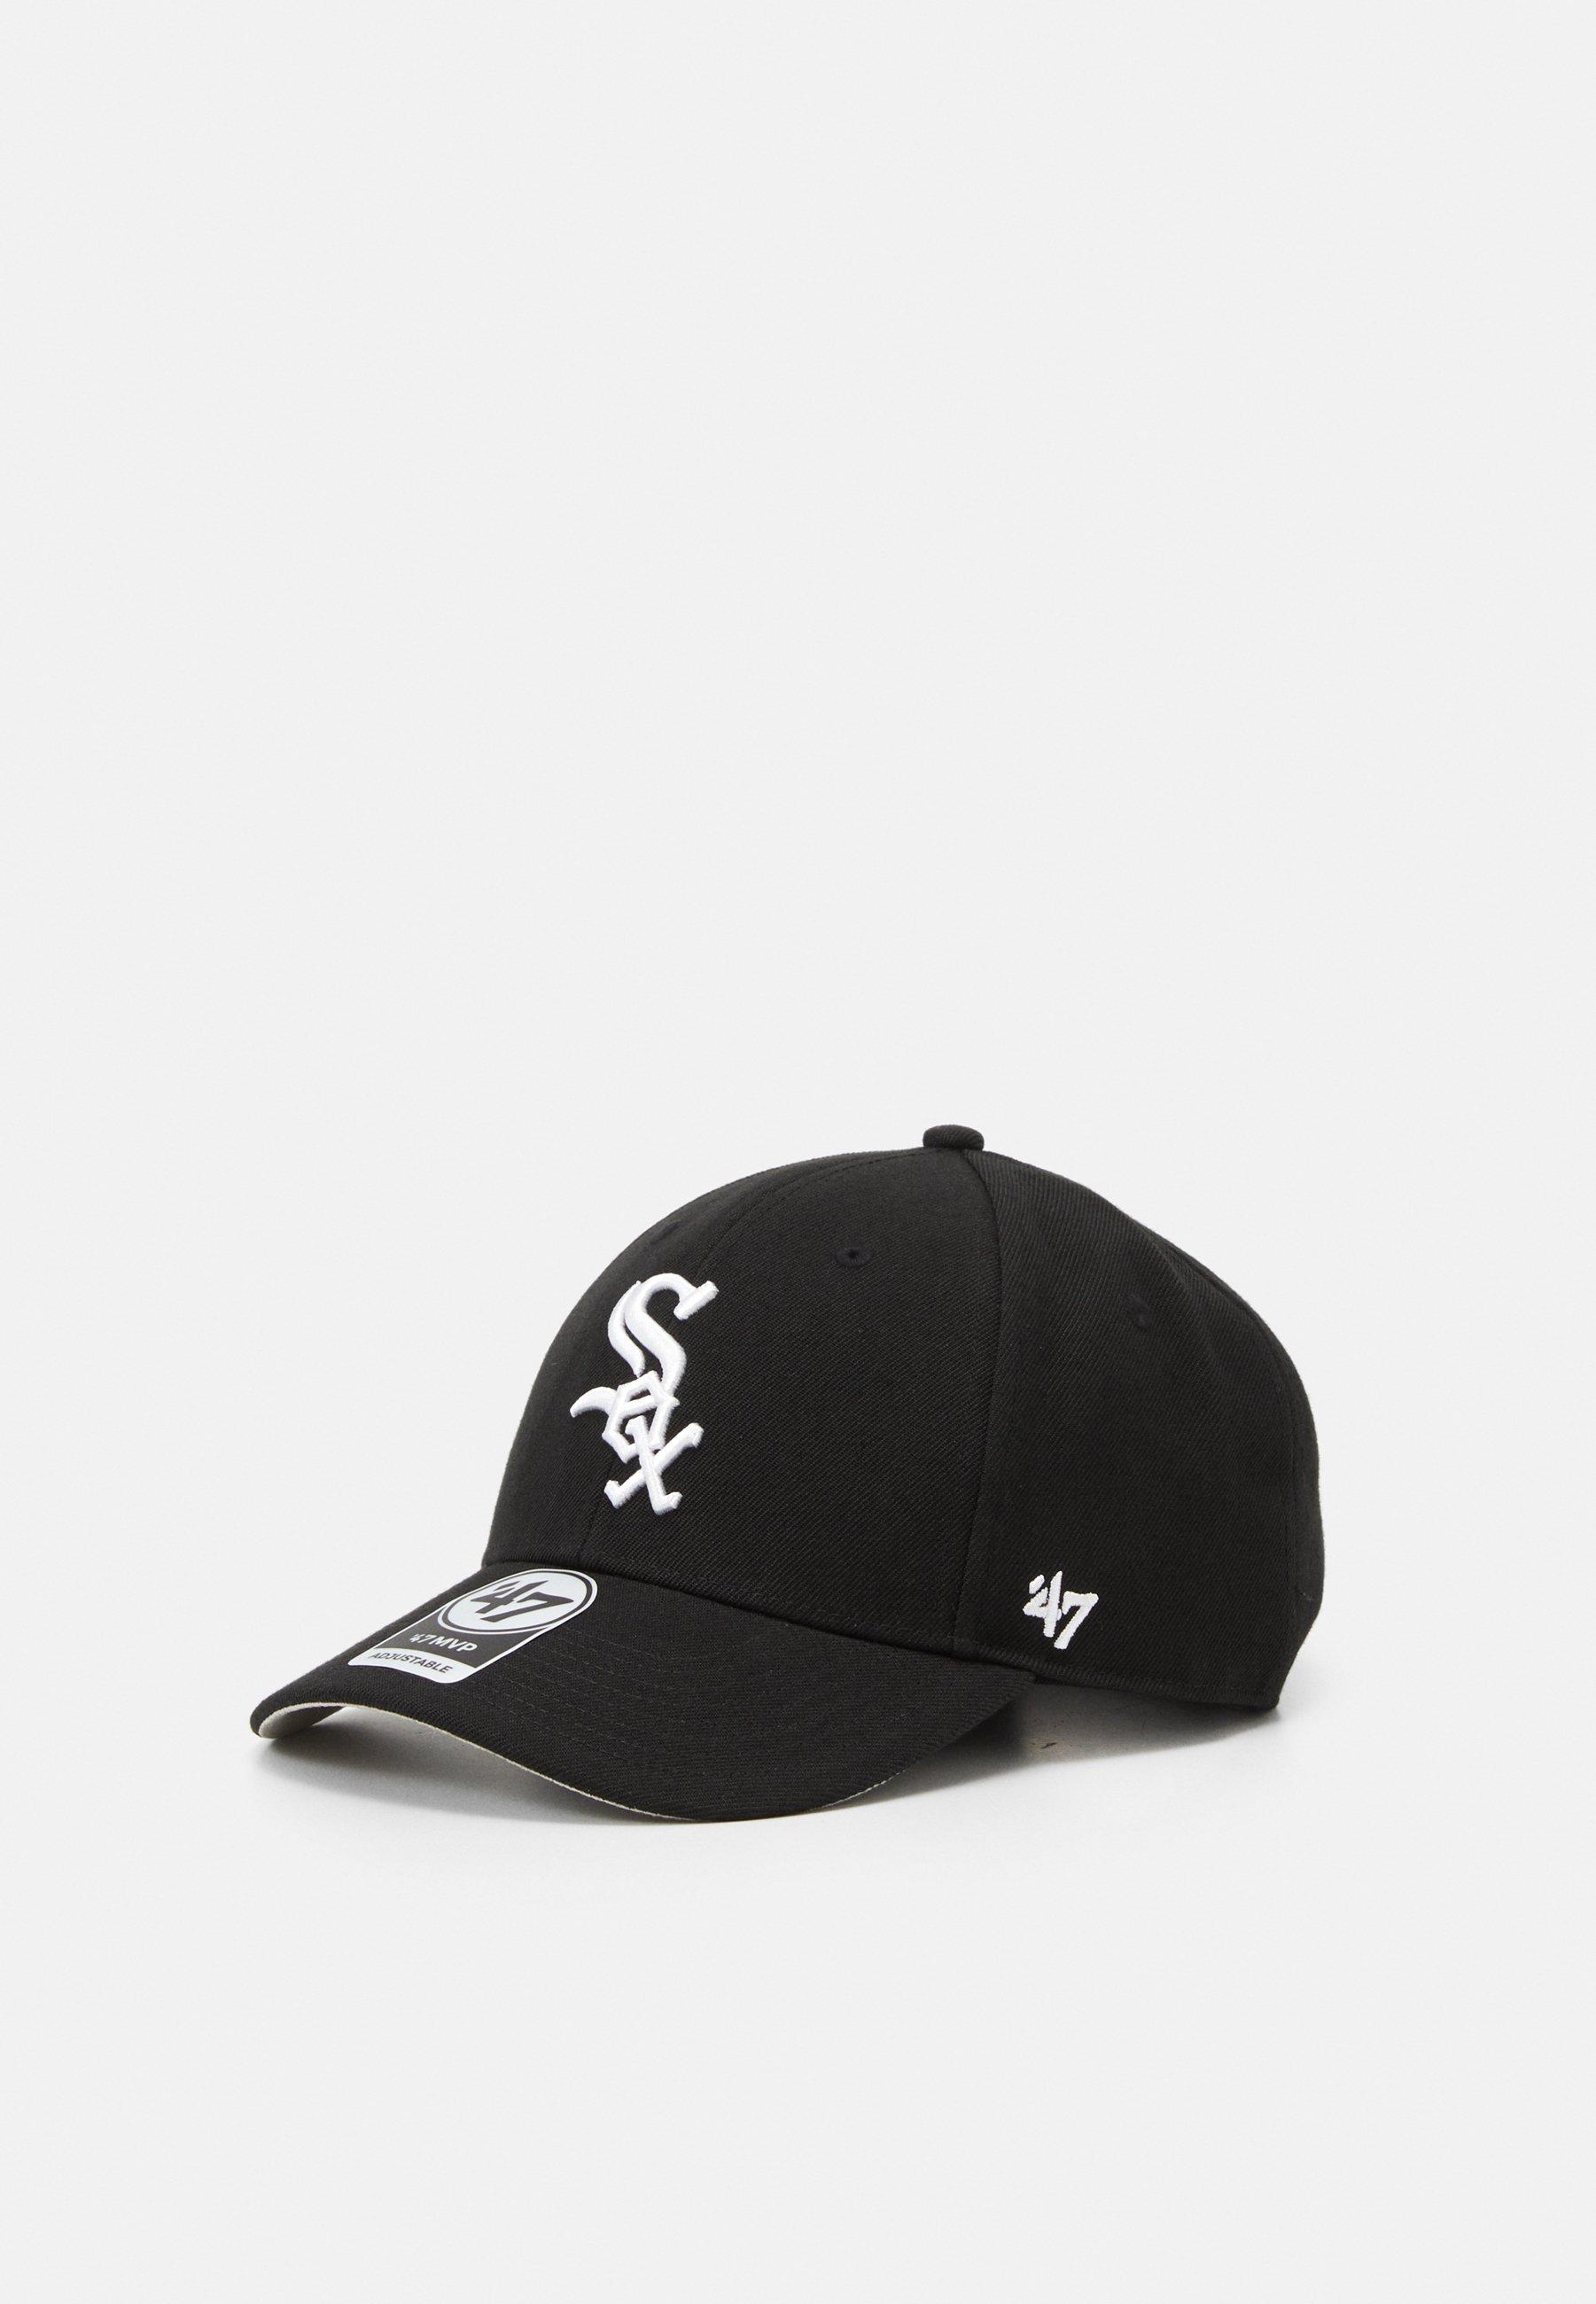 47 White Sox - Lippalakki Black